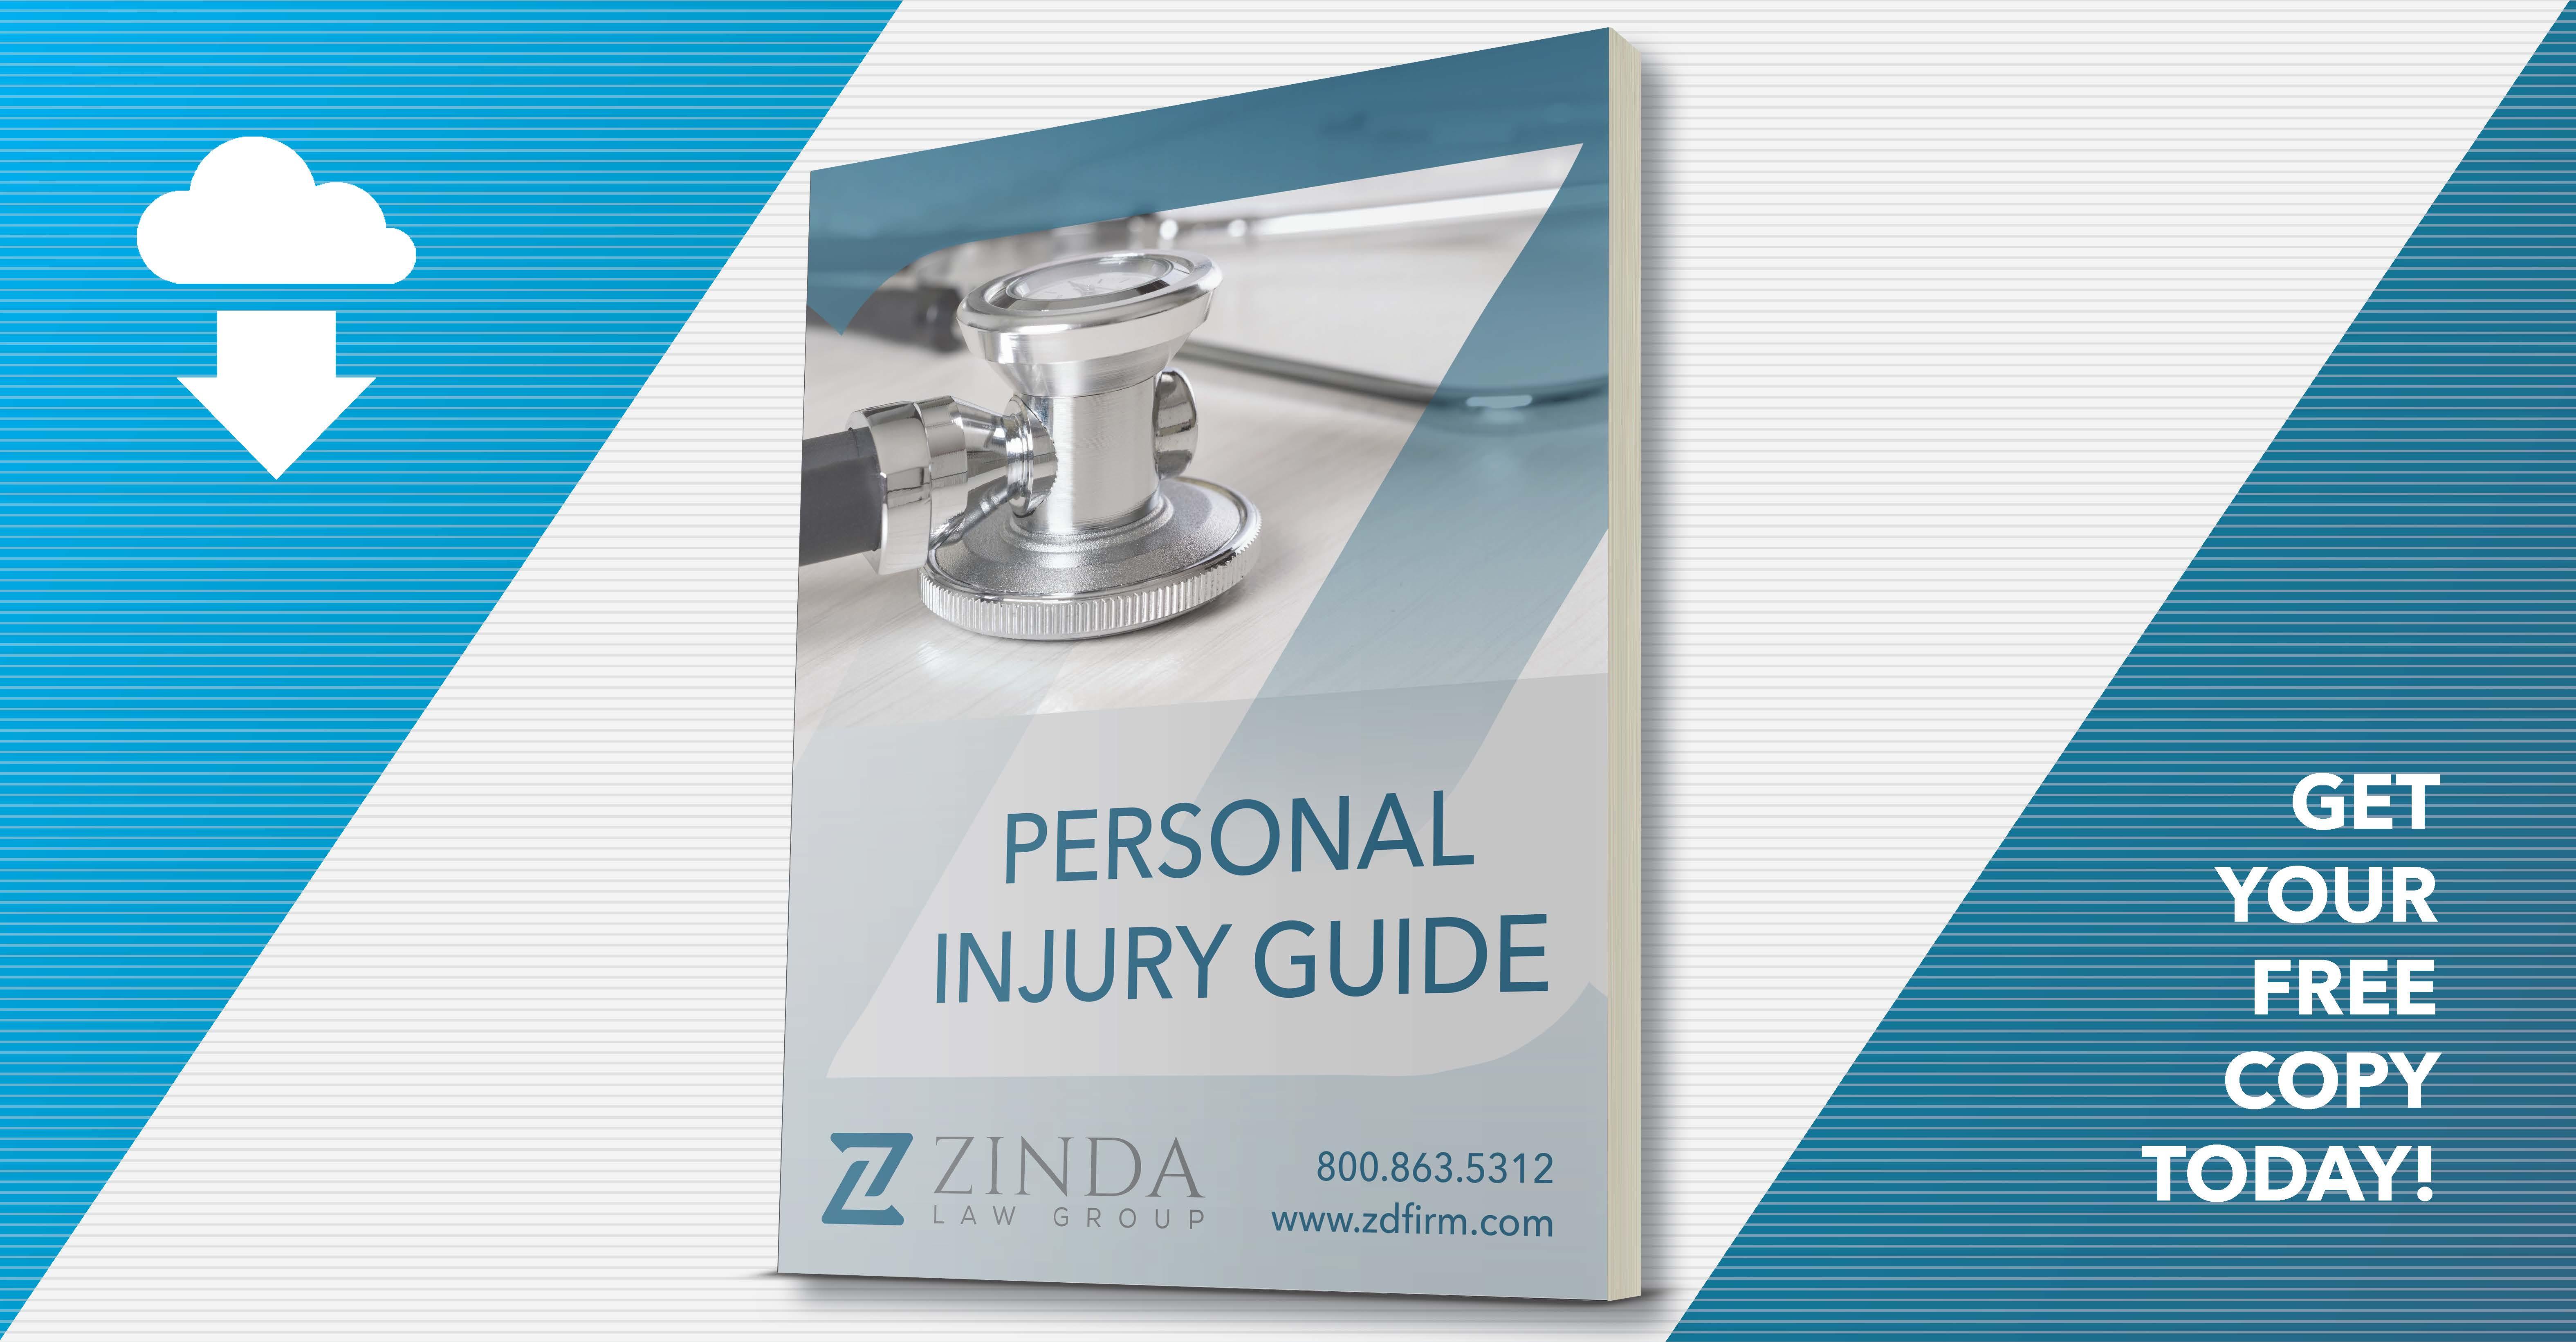 Free Personal Injury Guidebook Zinda Law Group